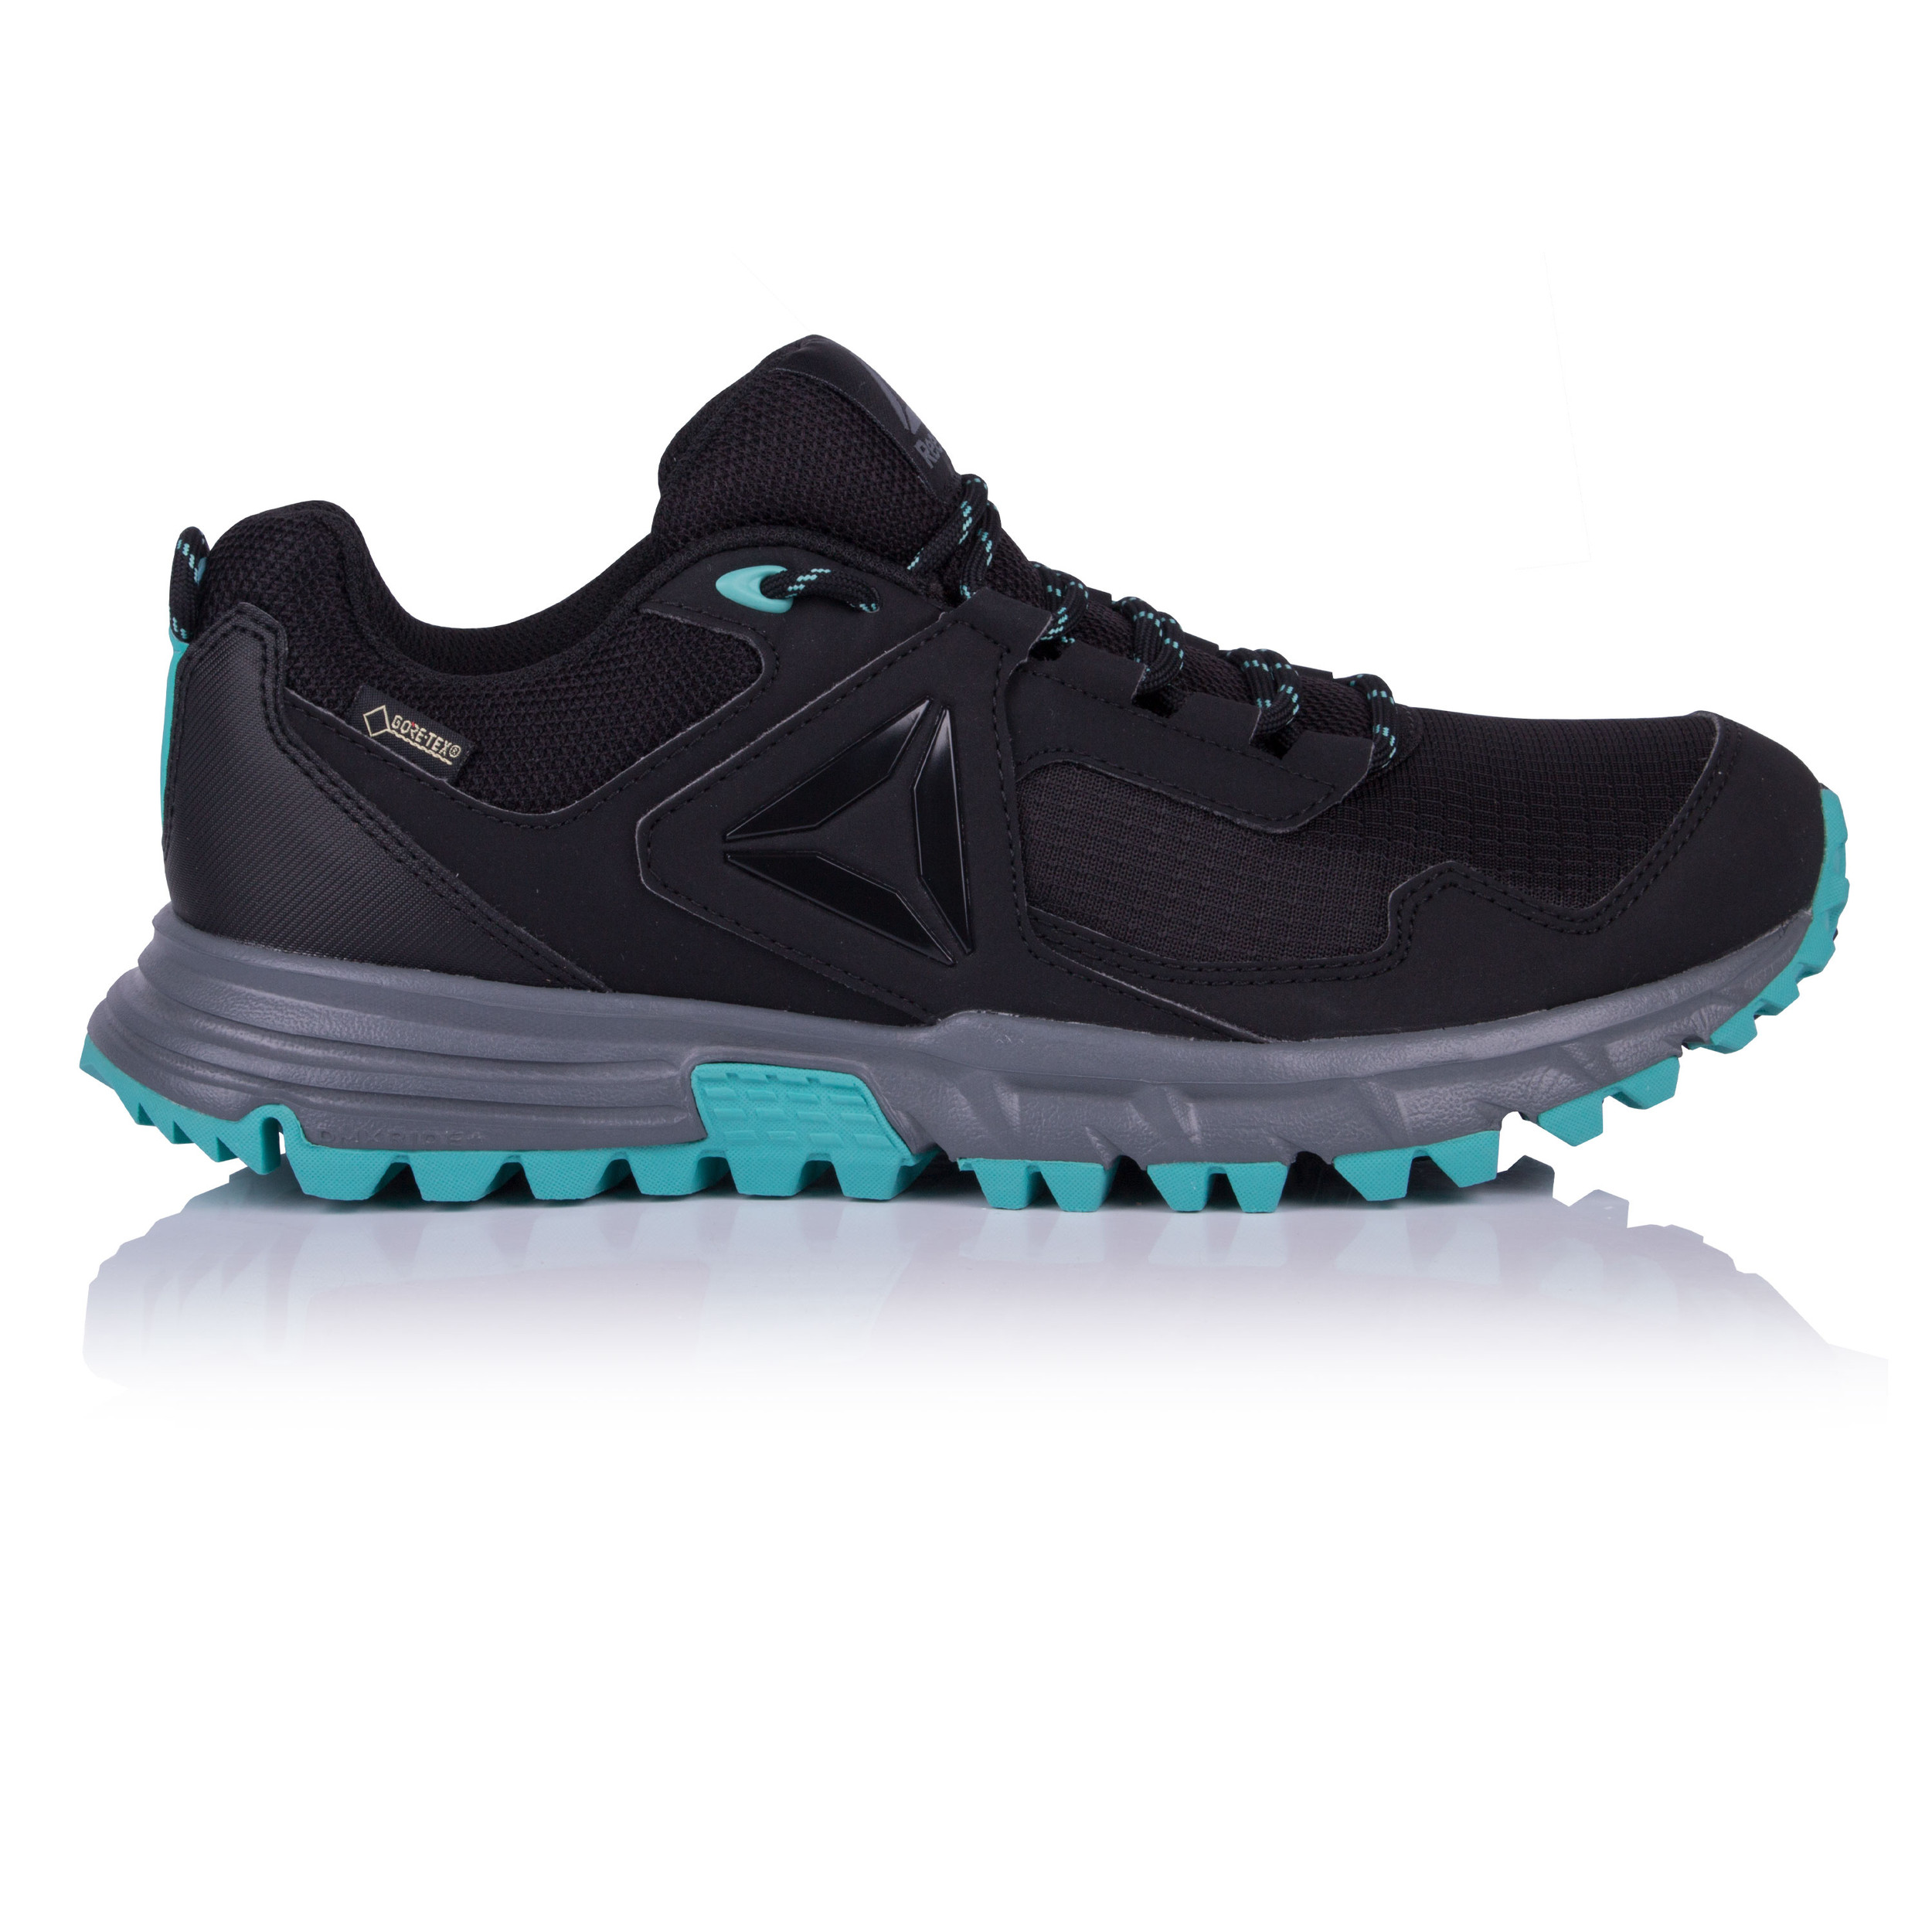 Details about Reebok Womens Sawcut 5.0 GORE TEX Walking Shoe Black Sports Outdoors Trainers